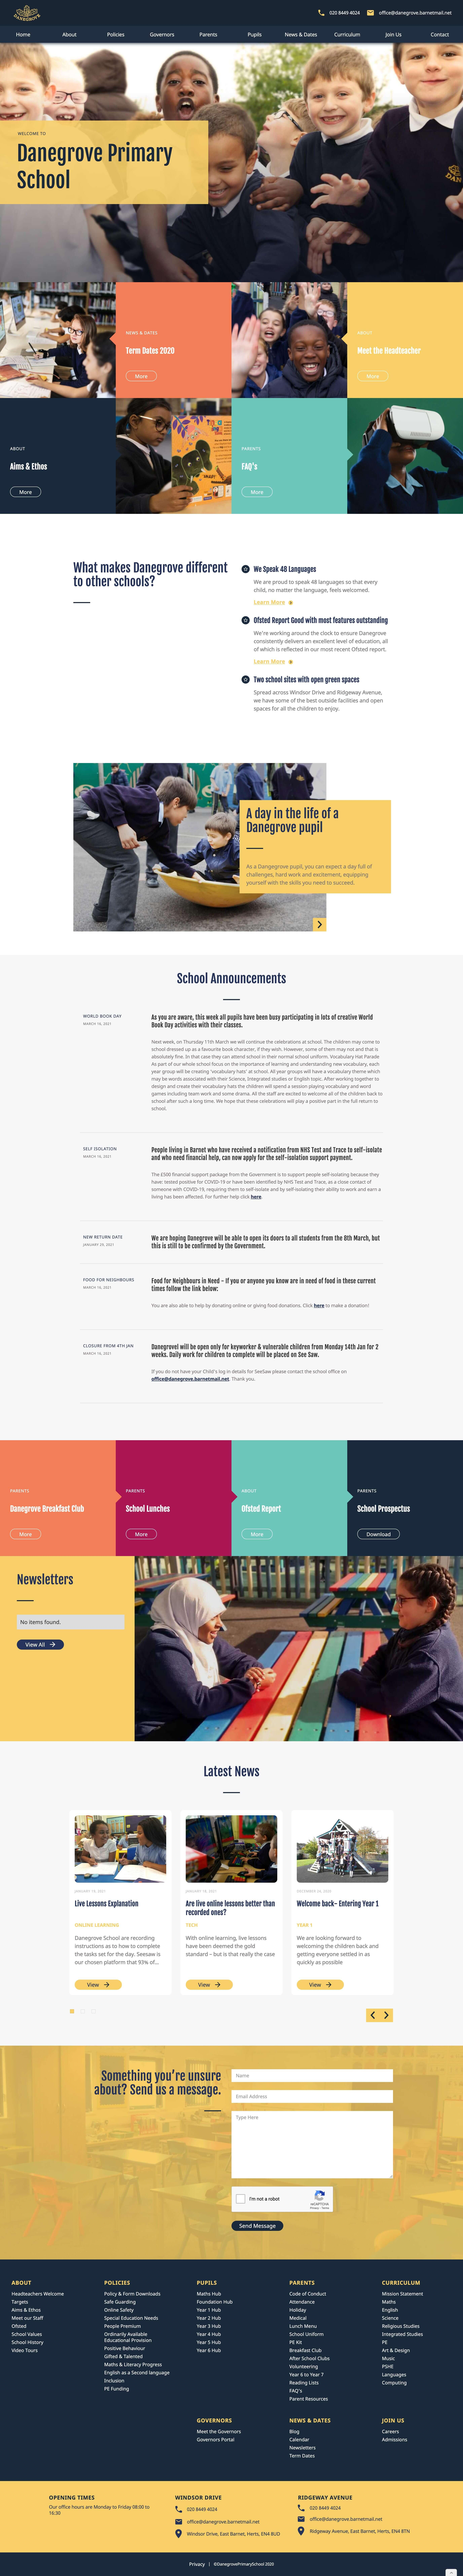 UI designs for Danegrove Primary School homepage